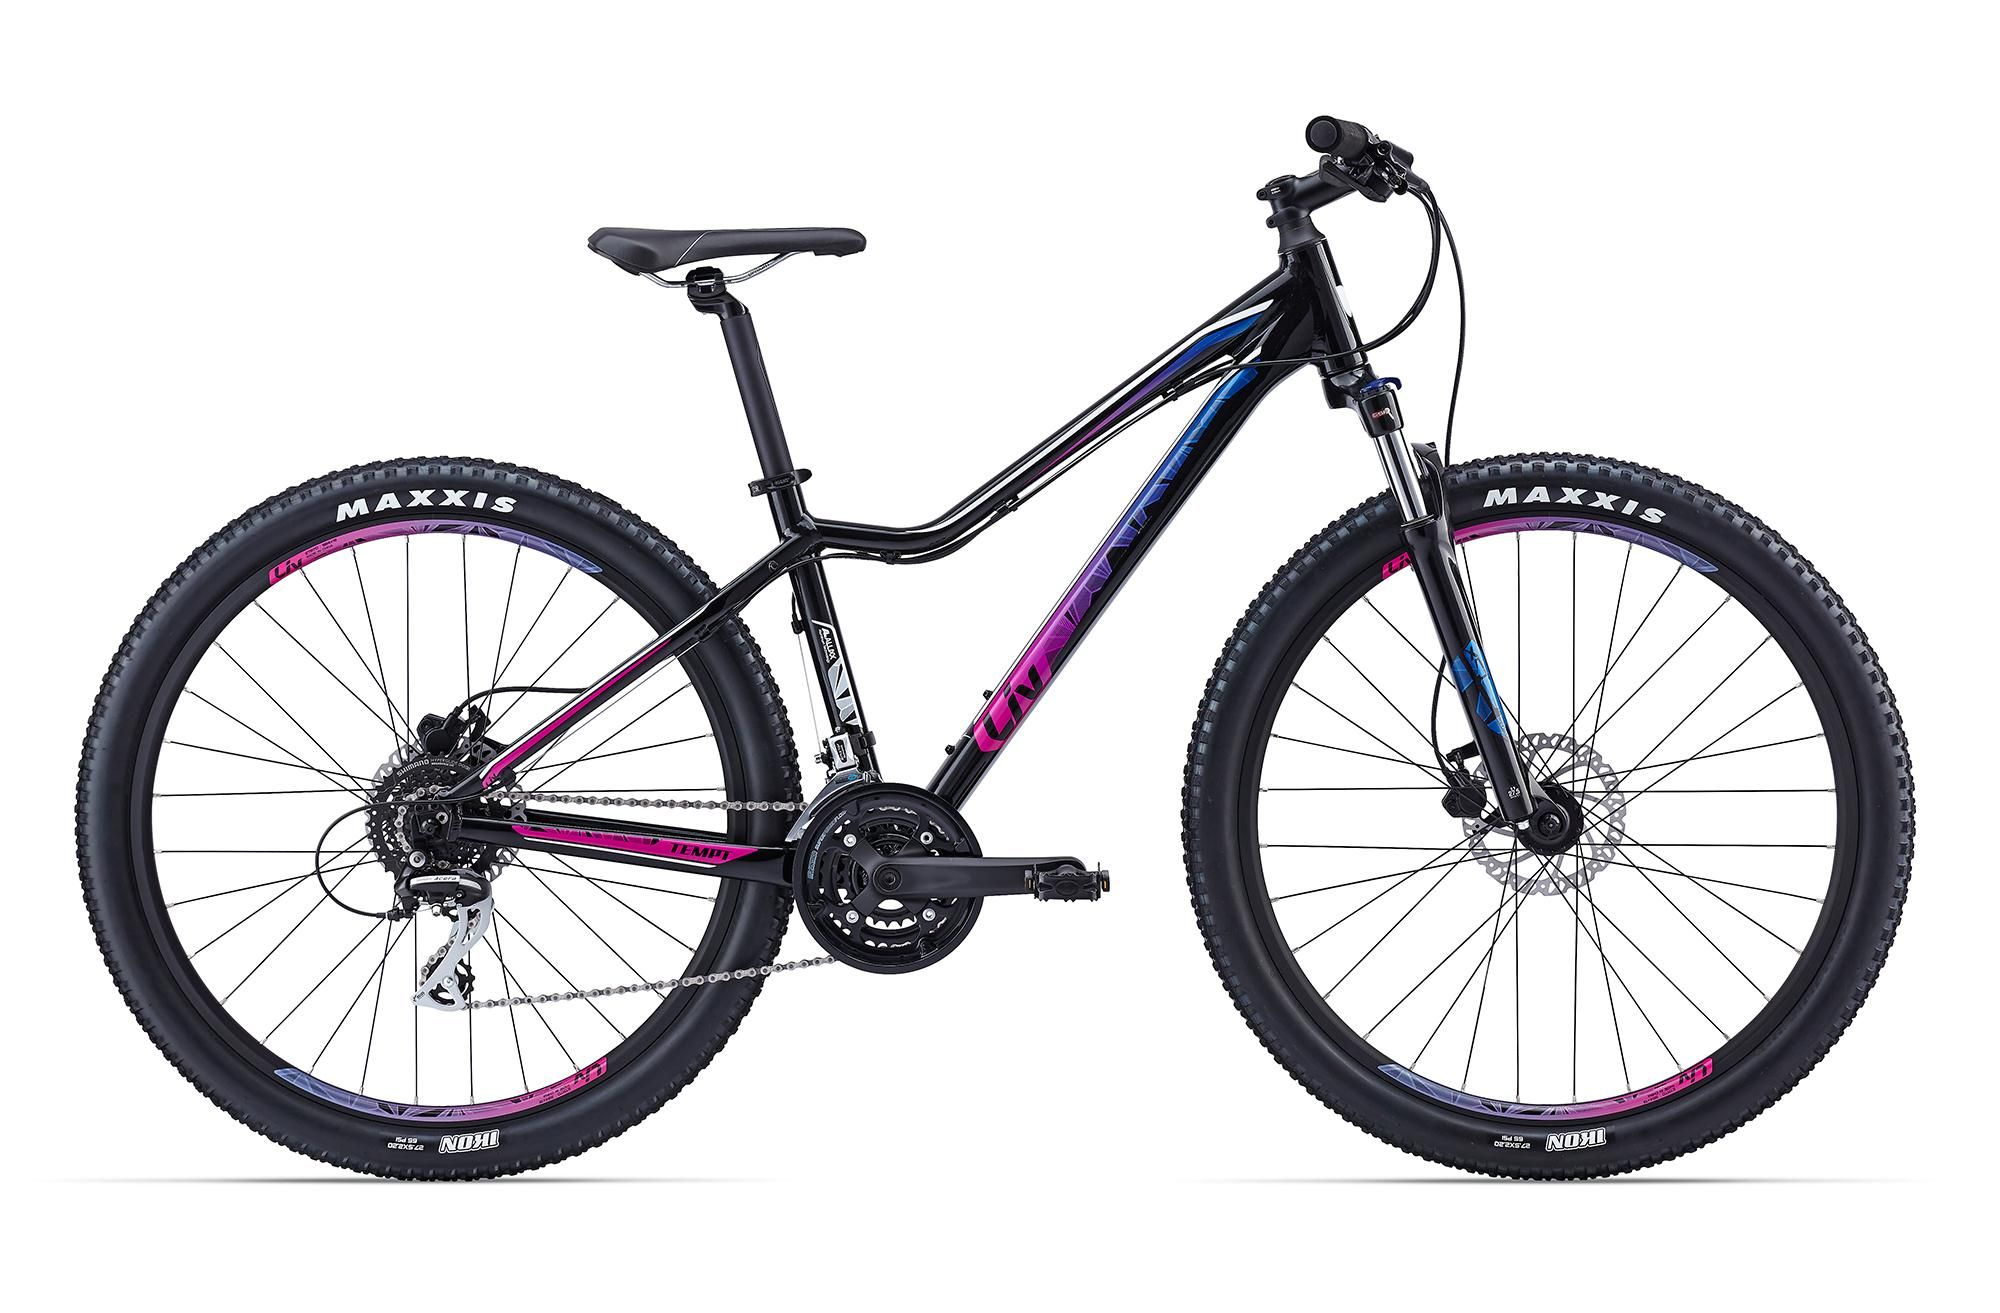 2016 Giant Liv Tempt 4 Womens Mountain Bike Black Pink Bicicletas